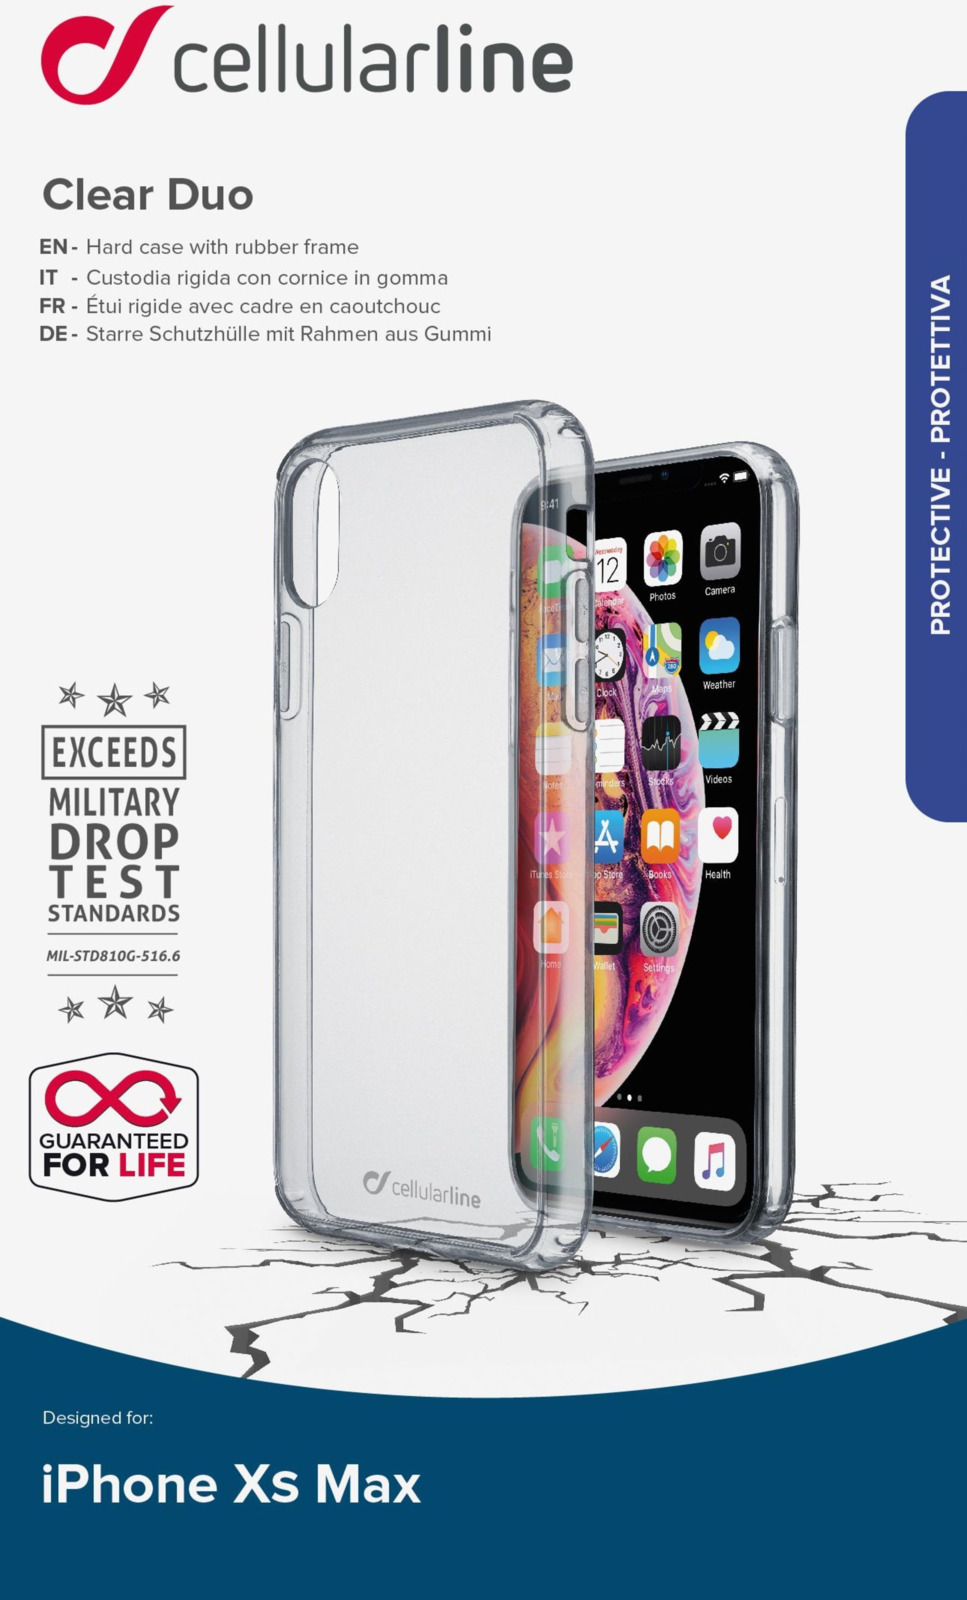 Фото - Чехол Cellularline для Apple iPhone XS Max, CLEARDUOIPHX65T, прозрачный чехол для iphone xs max cellularline clear duo прозрачный